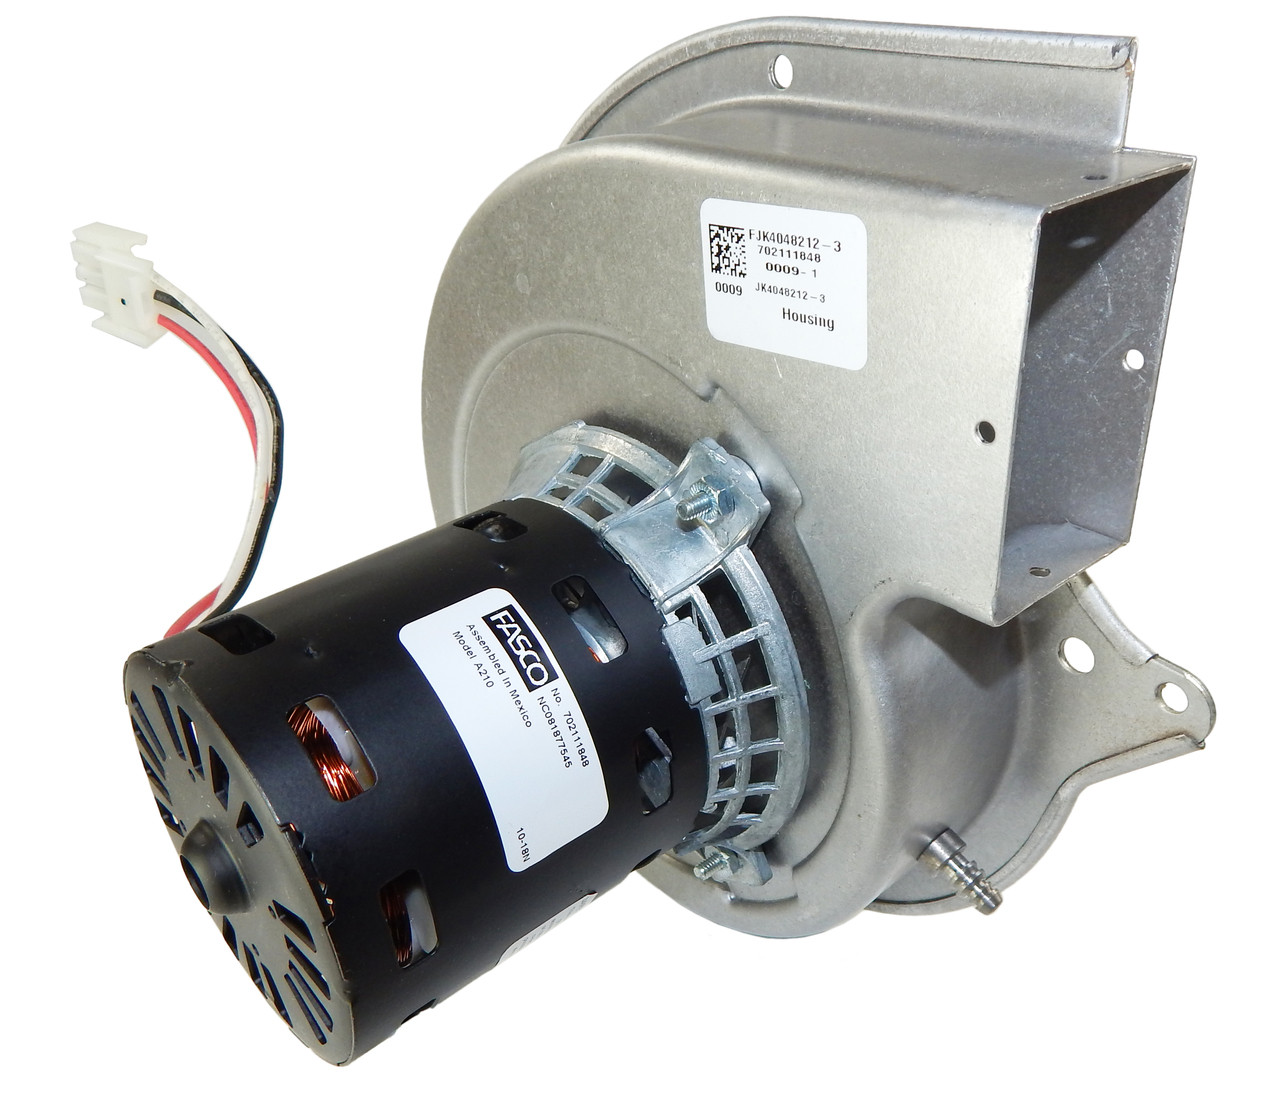 lennox furnace draft inducer blower 115v 7021 11063 18m67011 fasco a210 [ 1280 x 1100 Pixel ]